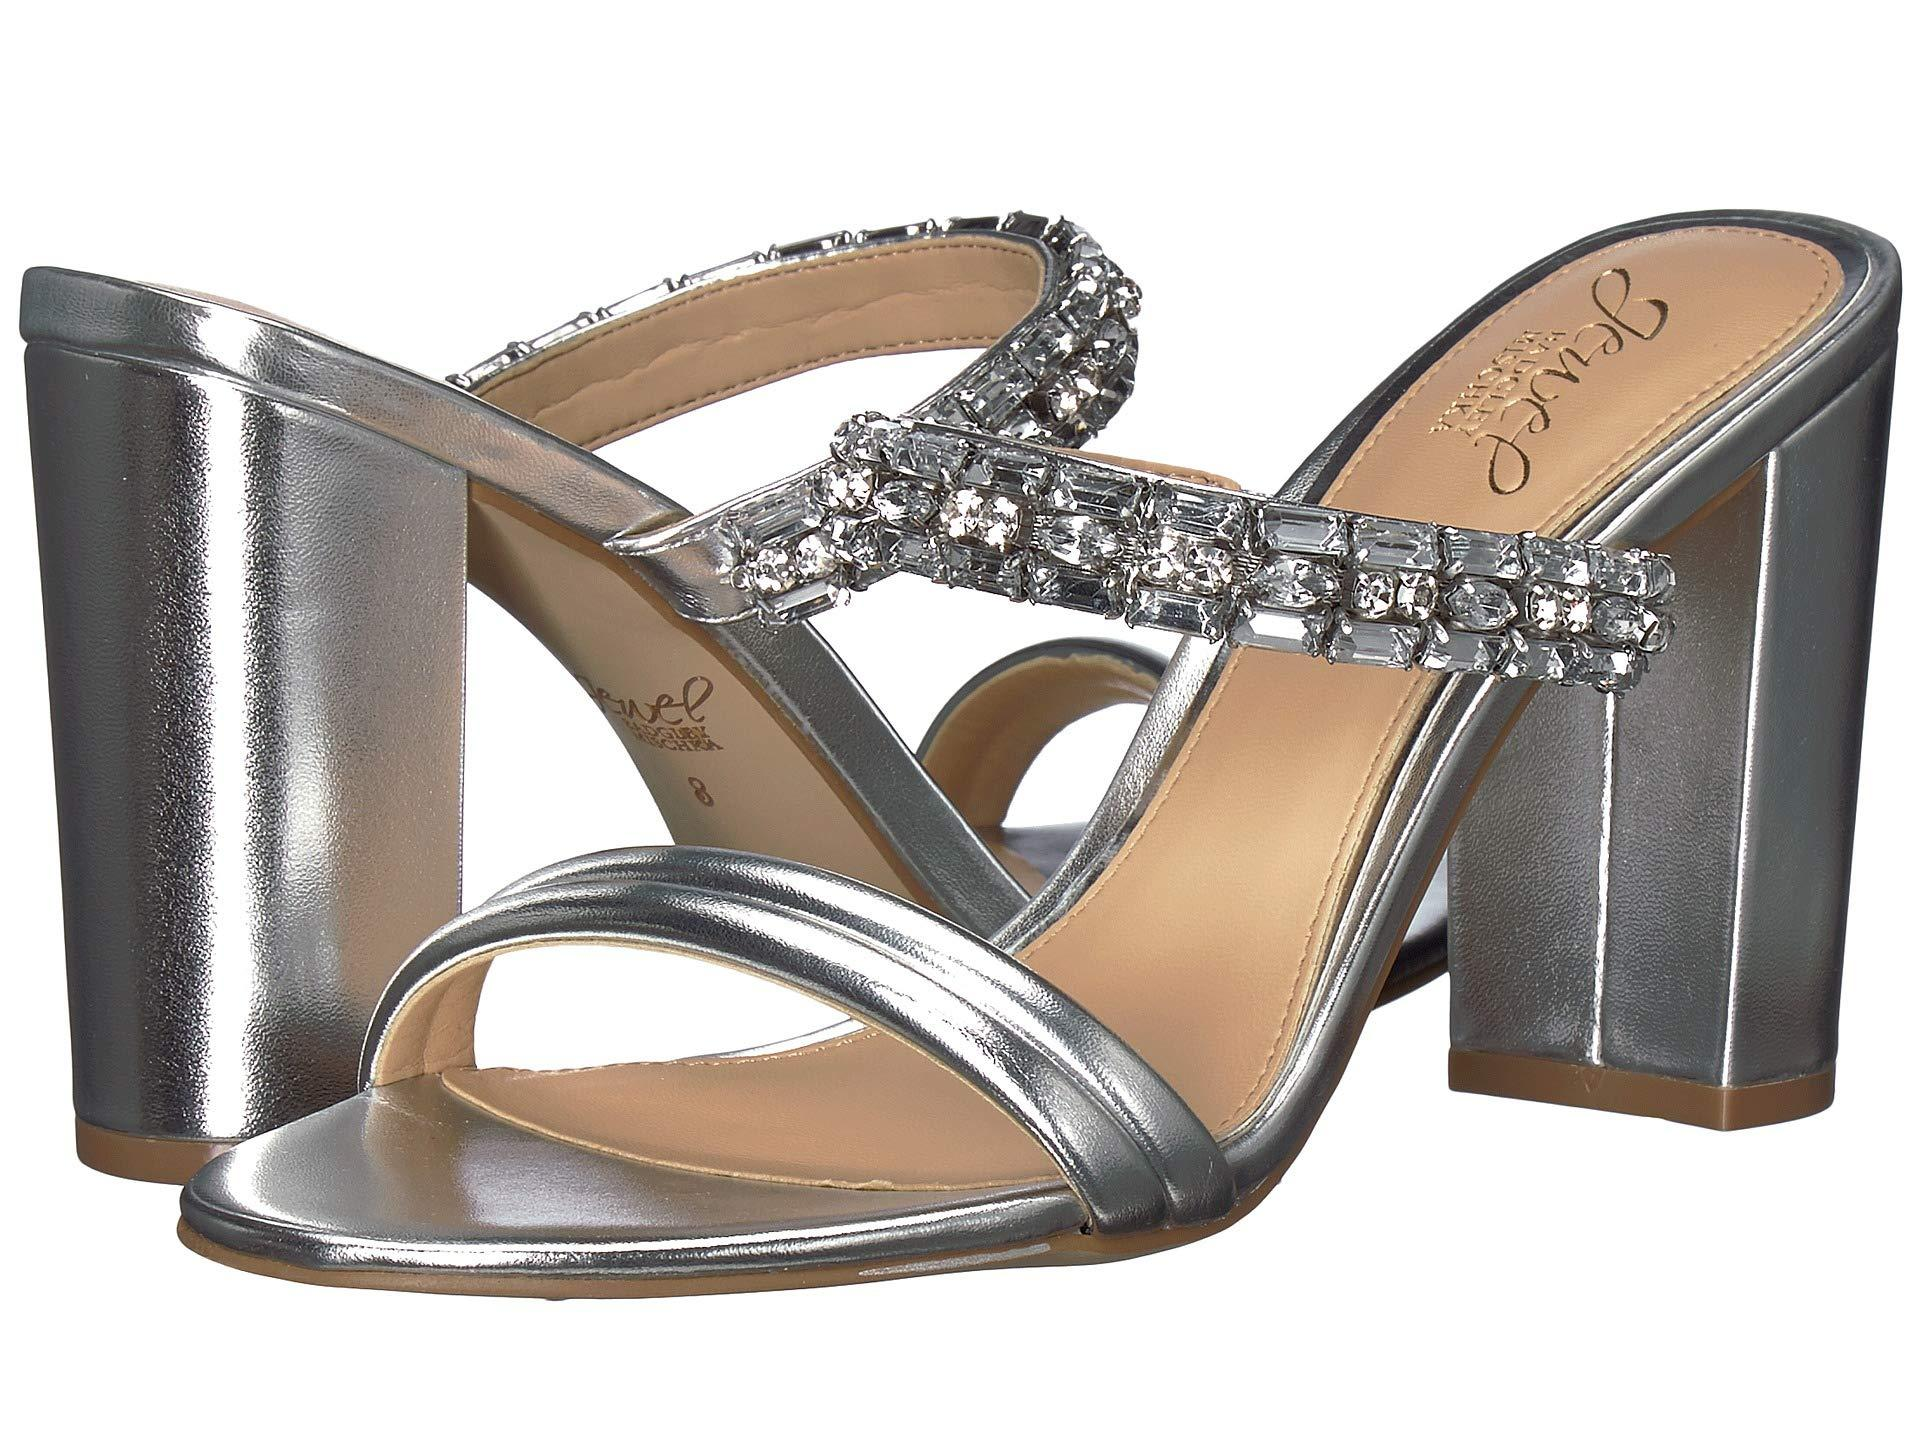 6283aefdac6 Lyst - Badgley Mischka Katherine (silver) Women s Shoes in Metallic